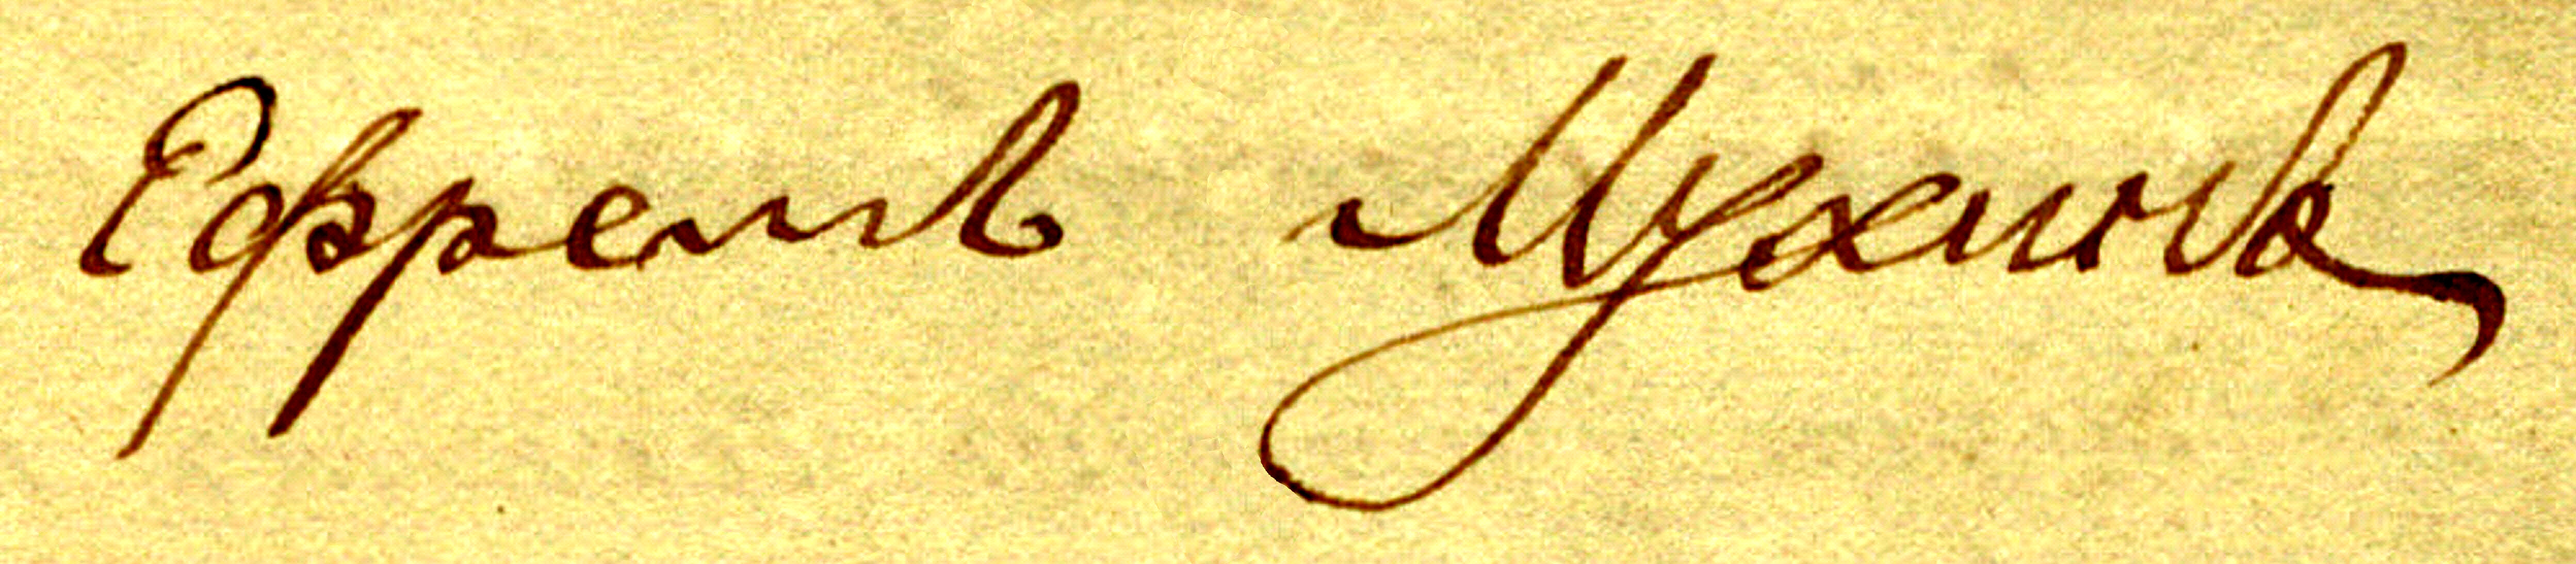 Автограф Е.О. Мухина (1825 г.) ретушь.jpg